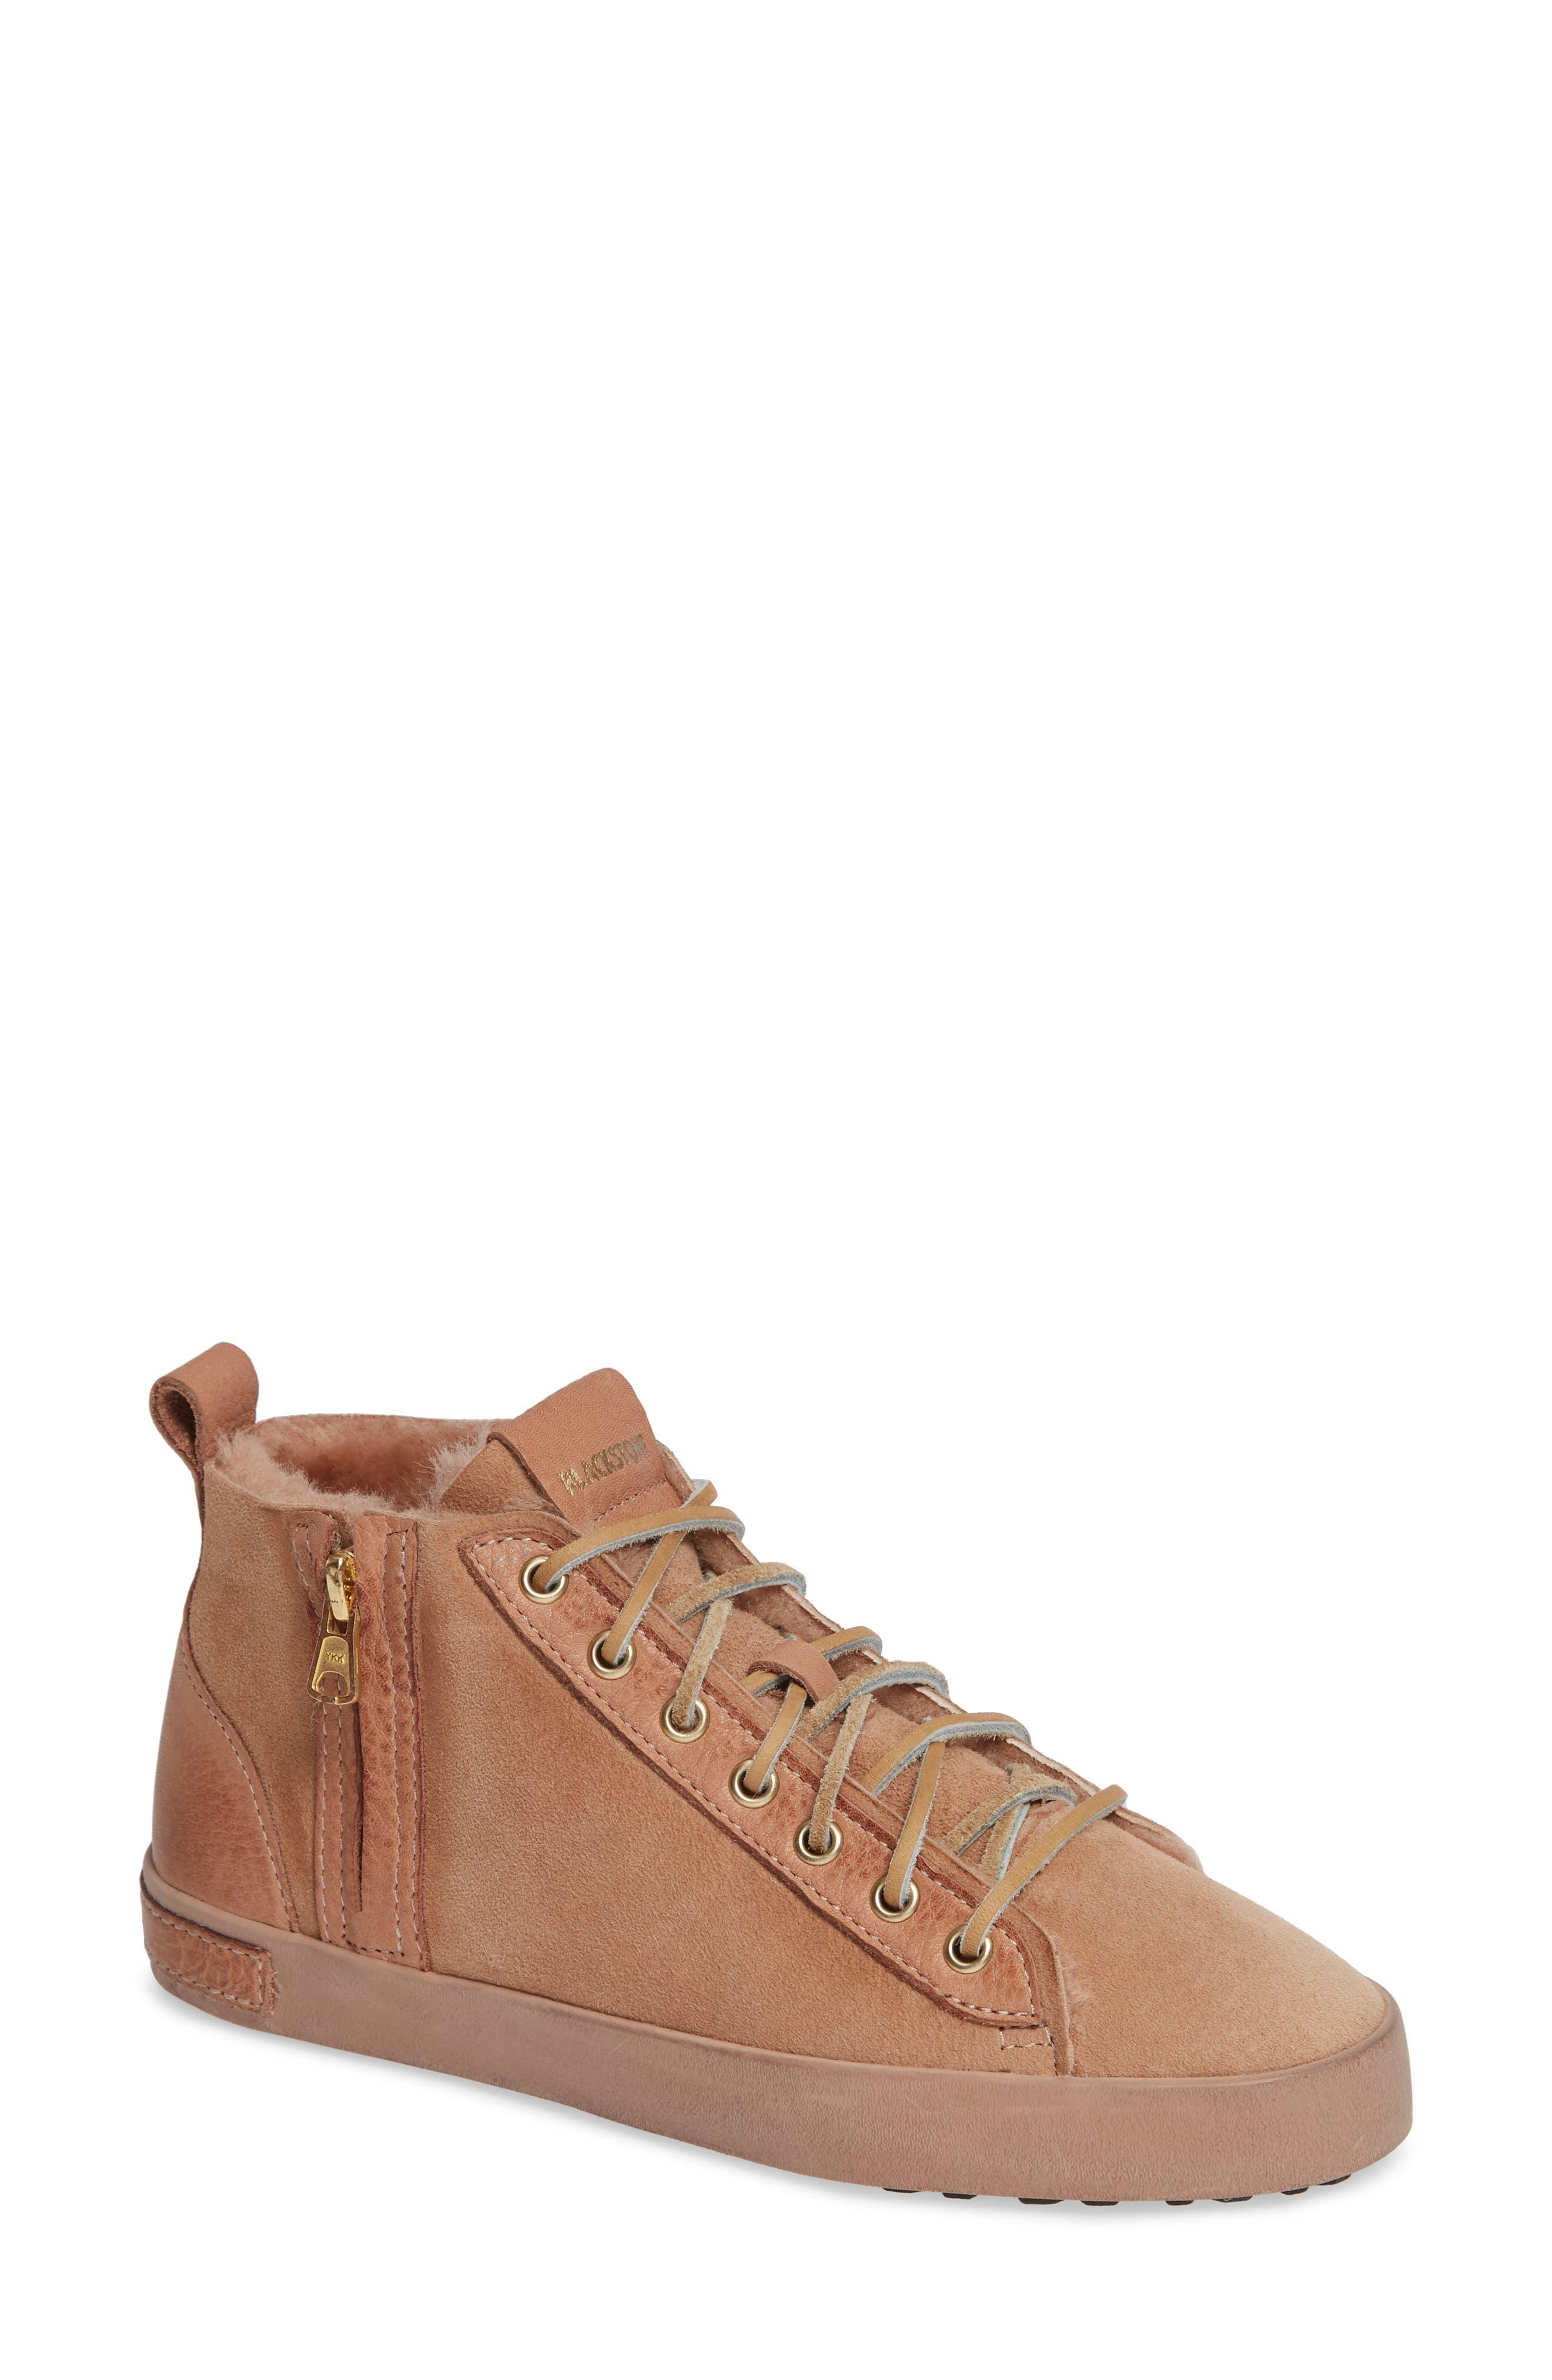 Blackstone Ql47 Genuine Shearling Lined Sneaker, Beige